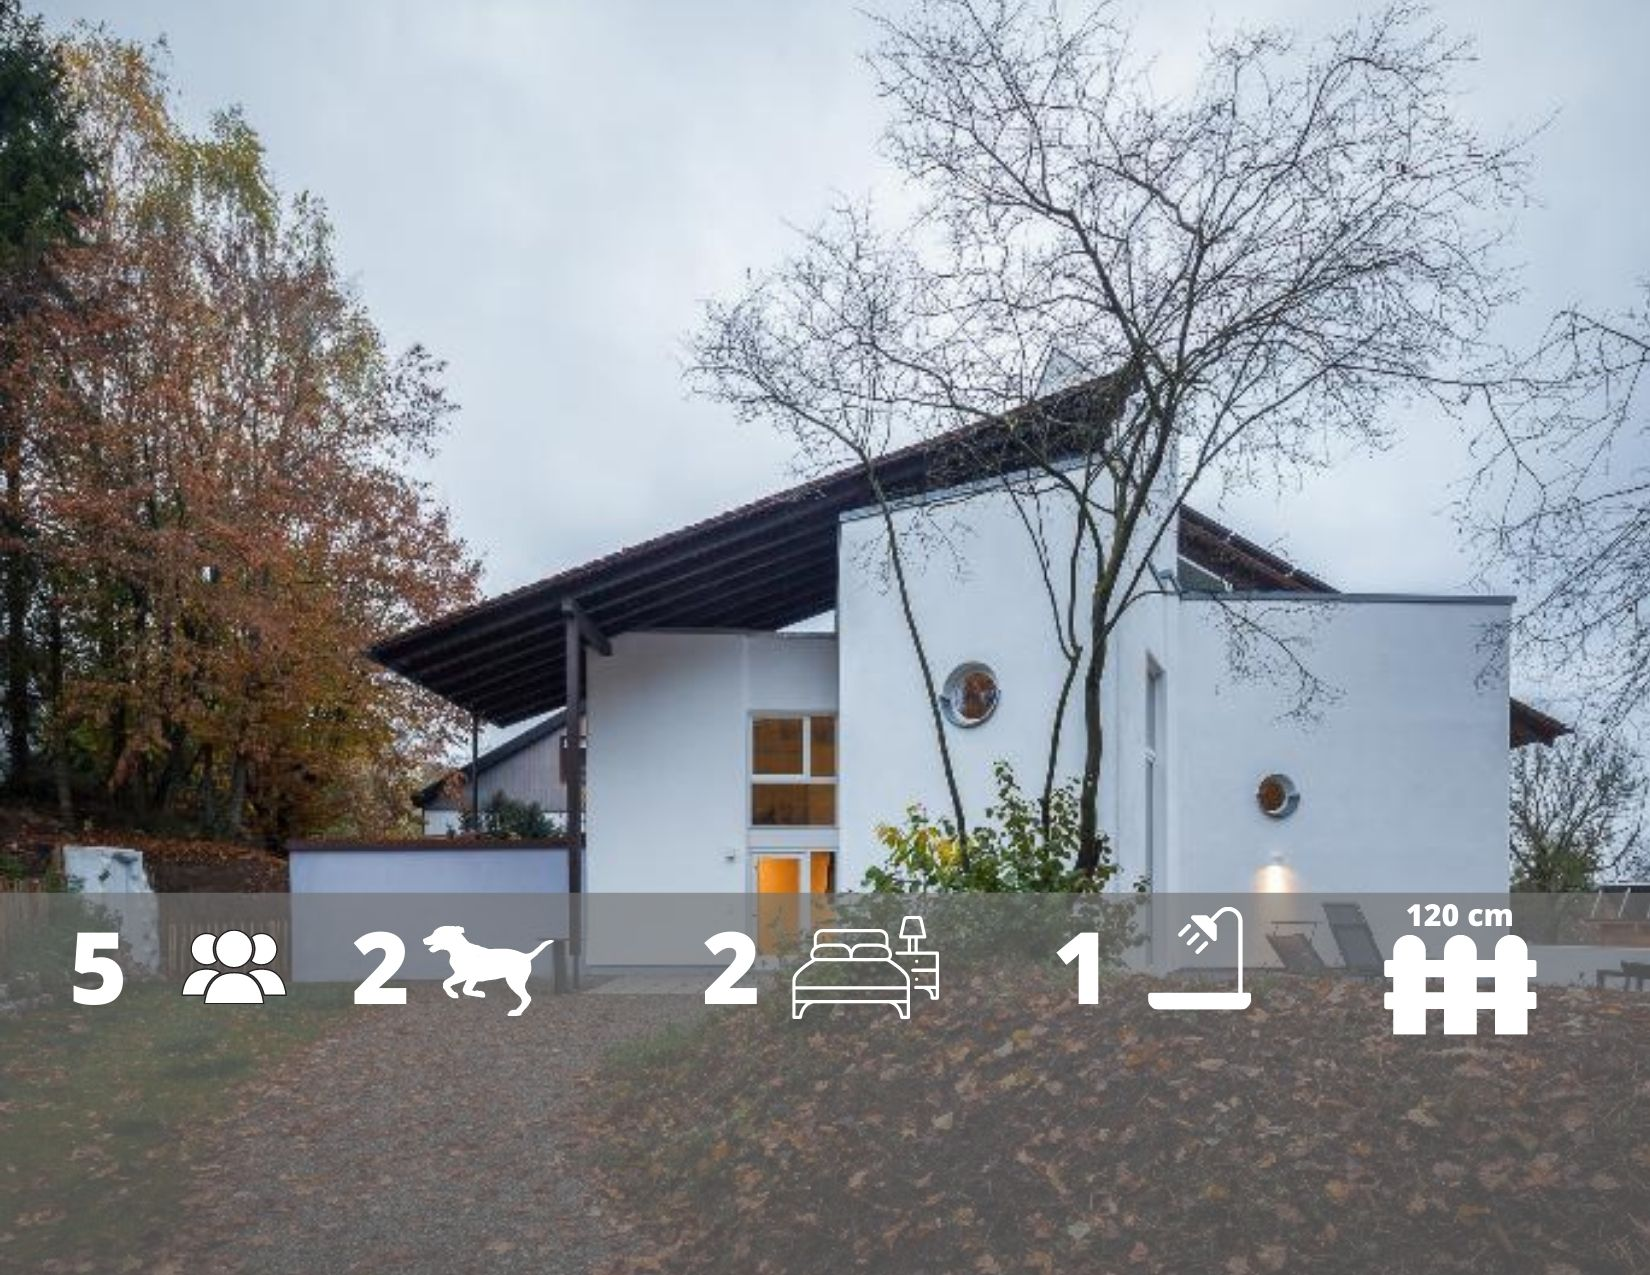 Ferienhaus Staege bau in Rot am See